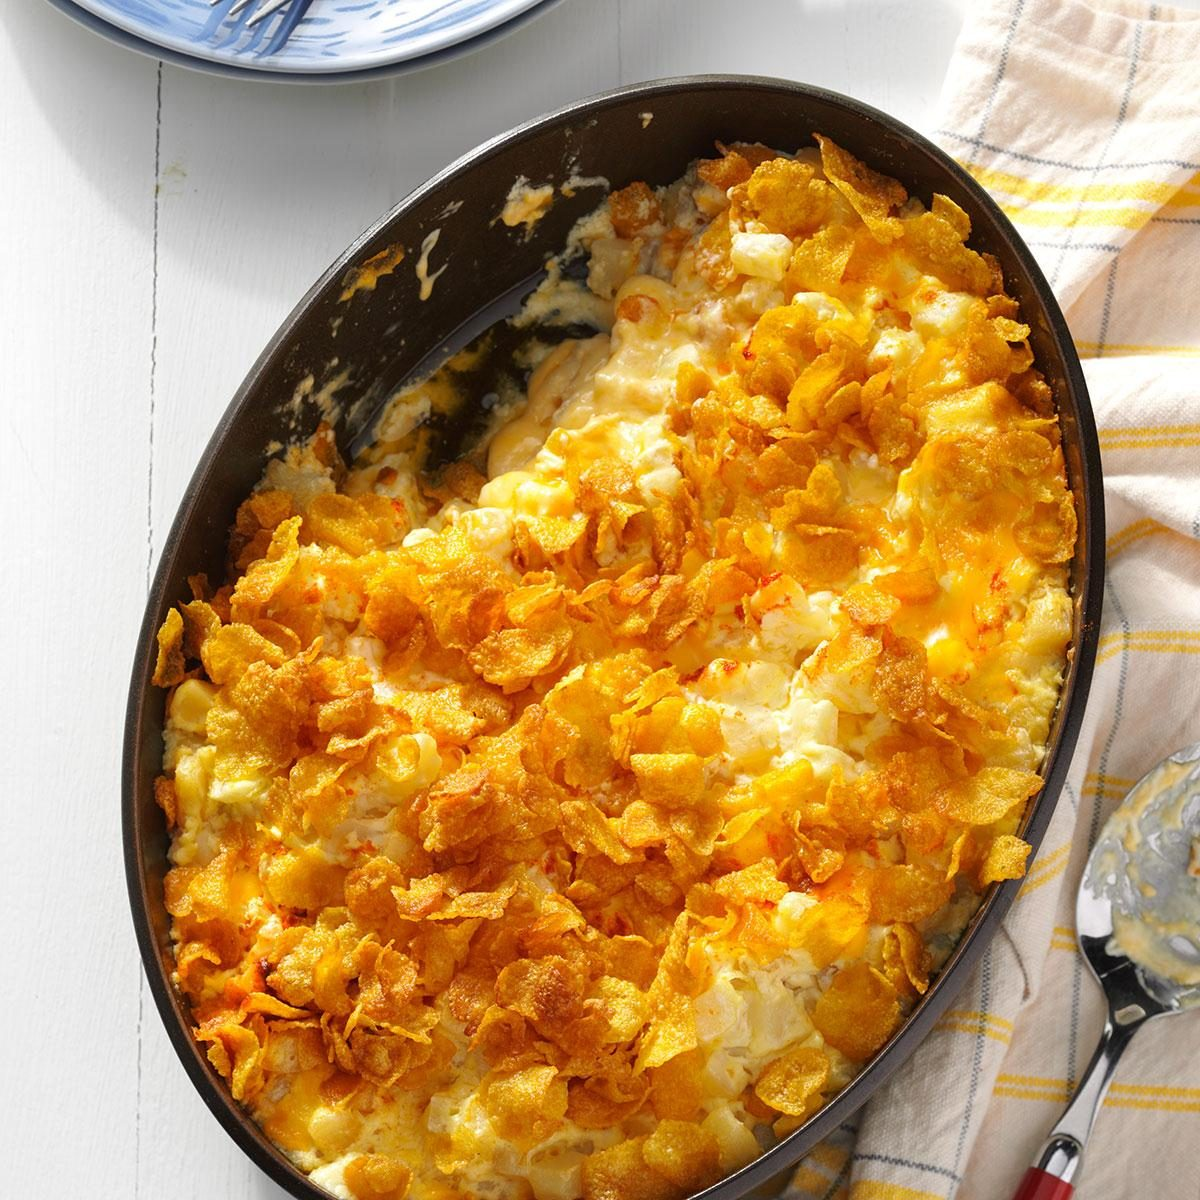 Creamy Hash Brown Casserole Recipe | Taste of Home